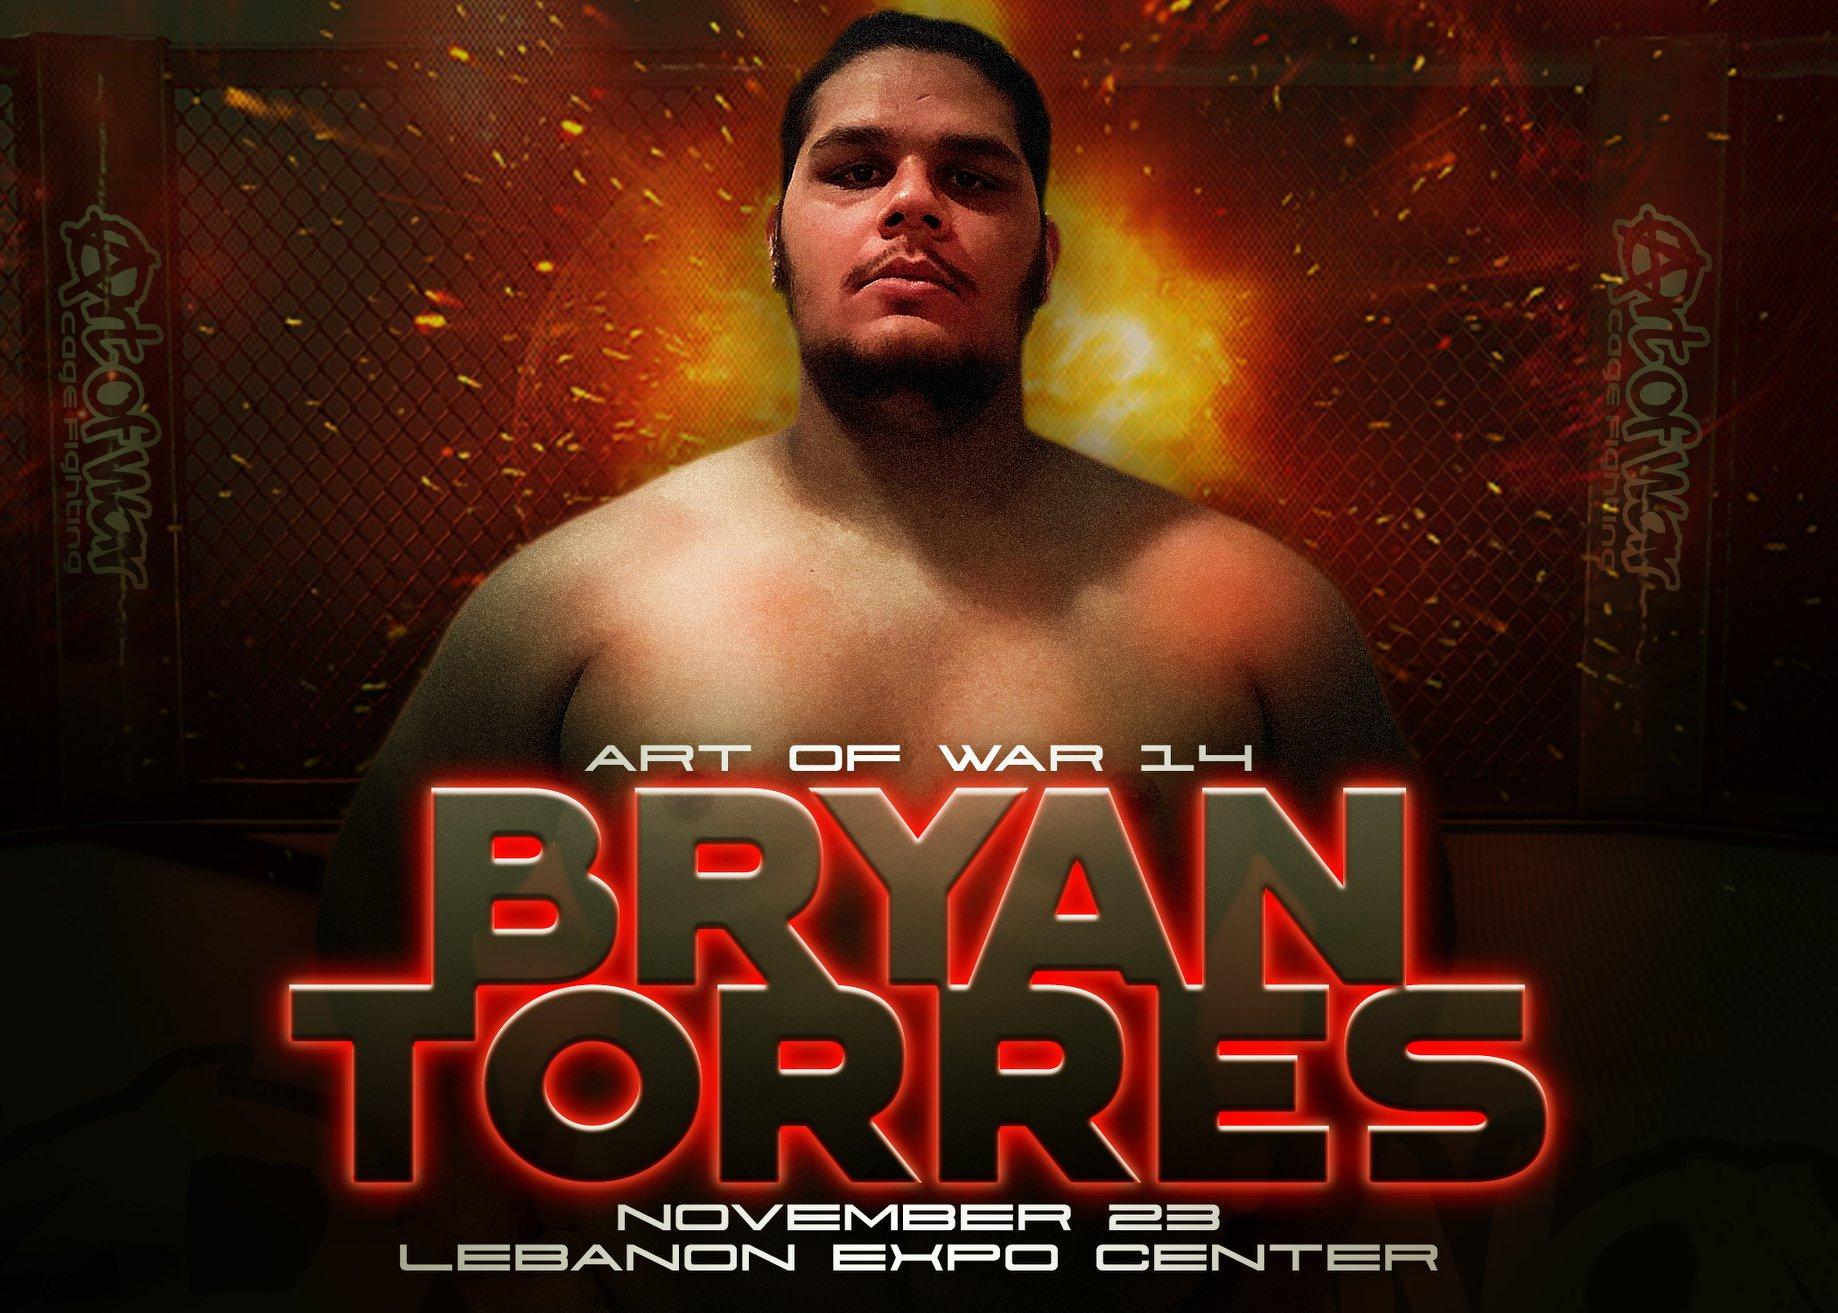 Bryan Torres